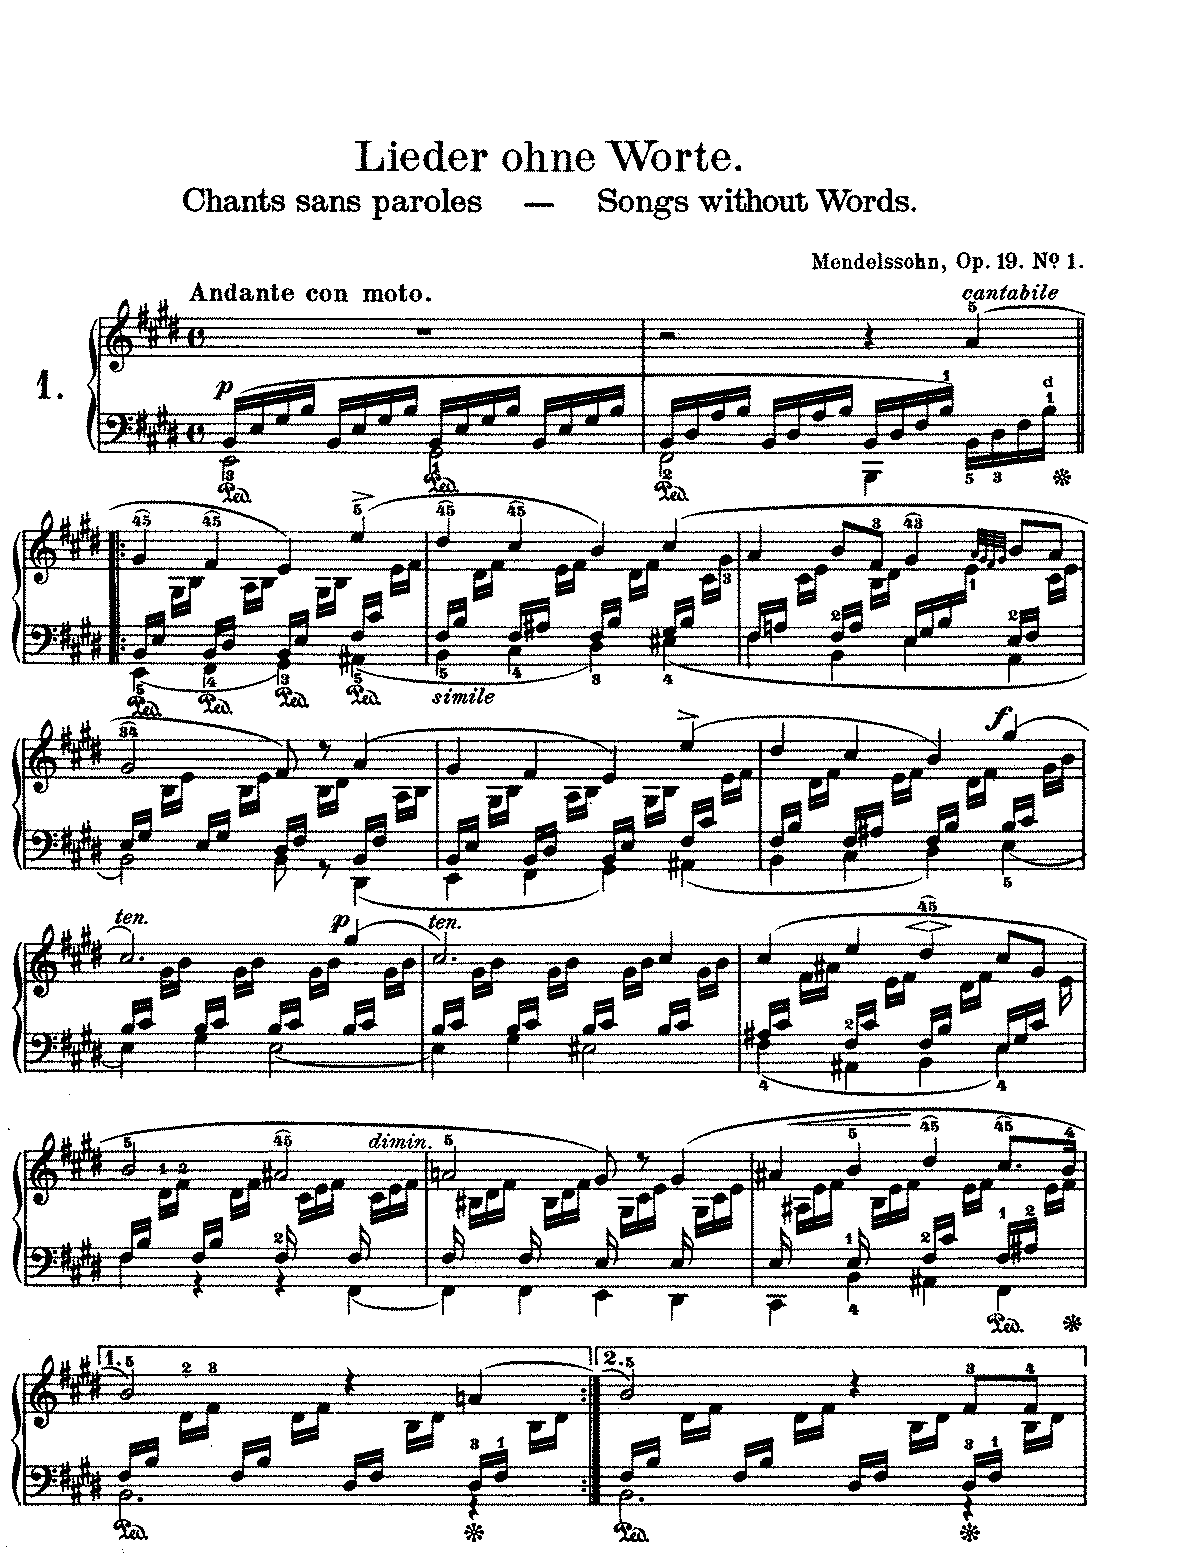 Work by Mendelssohn